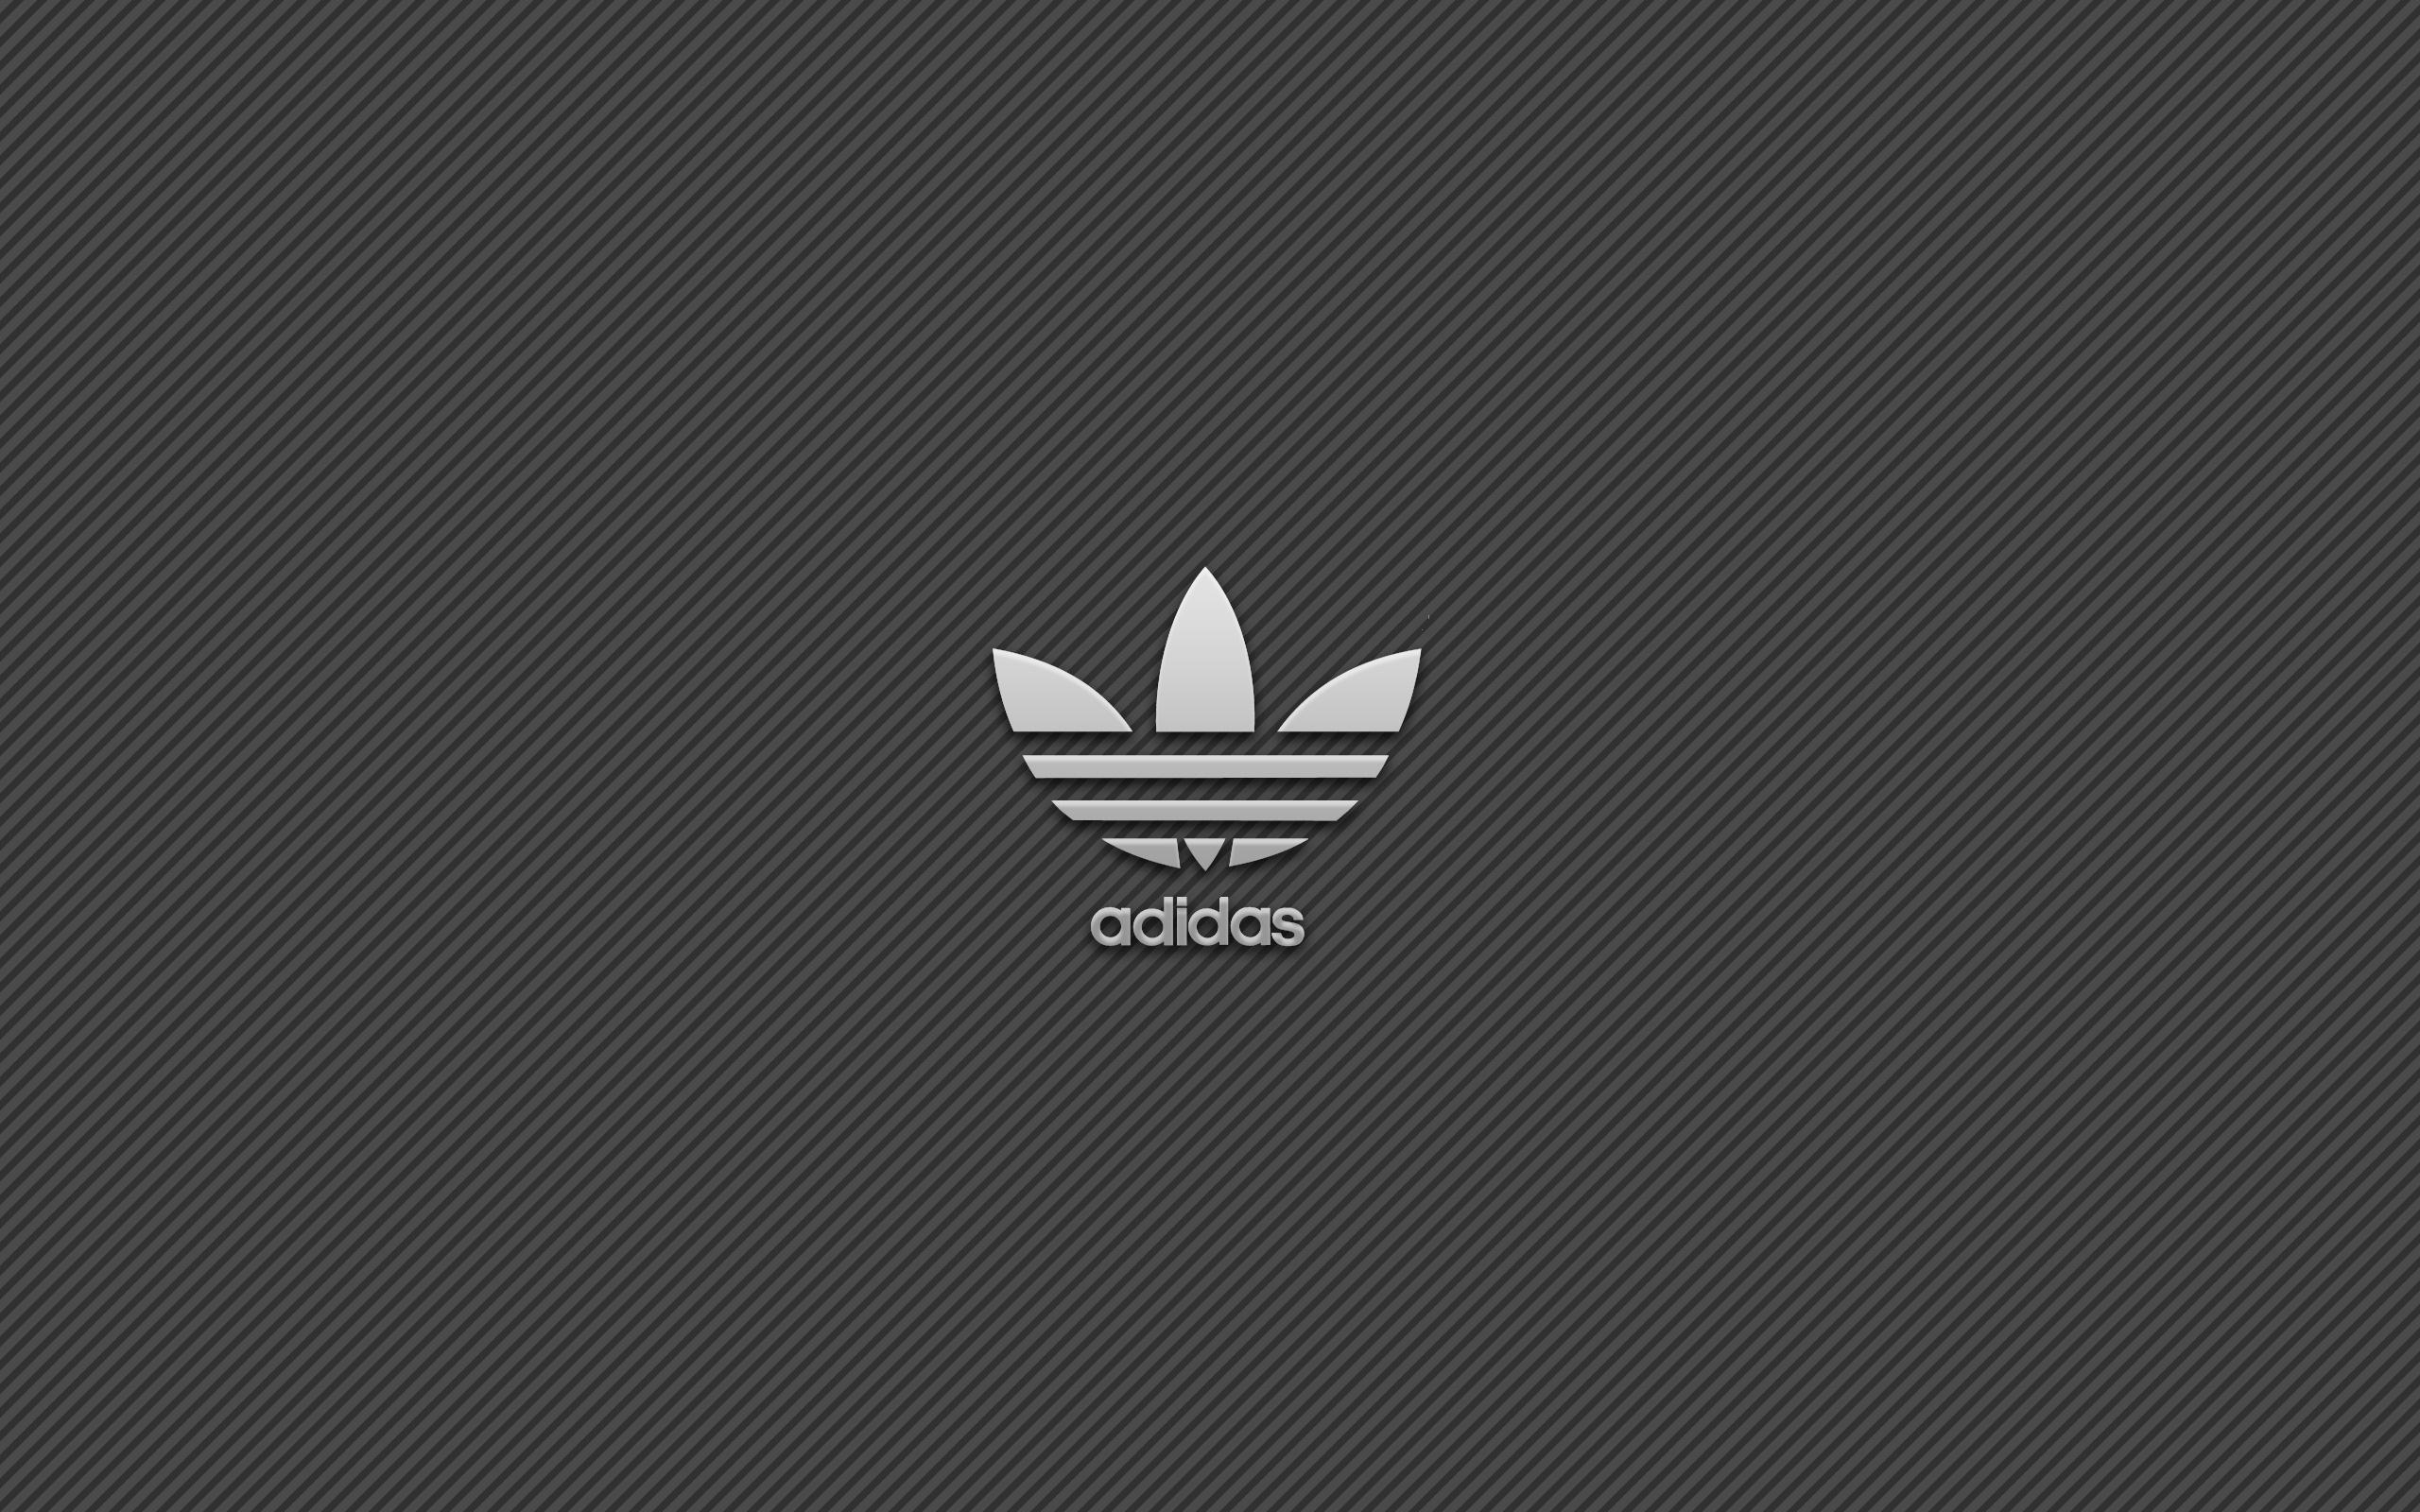 Adidas Simple Logo Background   2560x1600   1489786 2560x1600